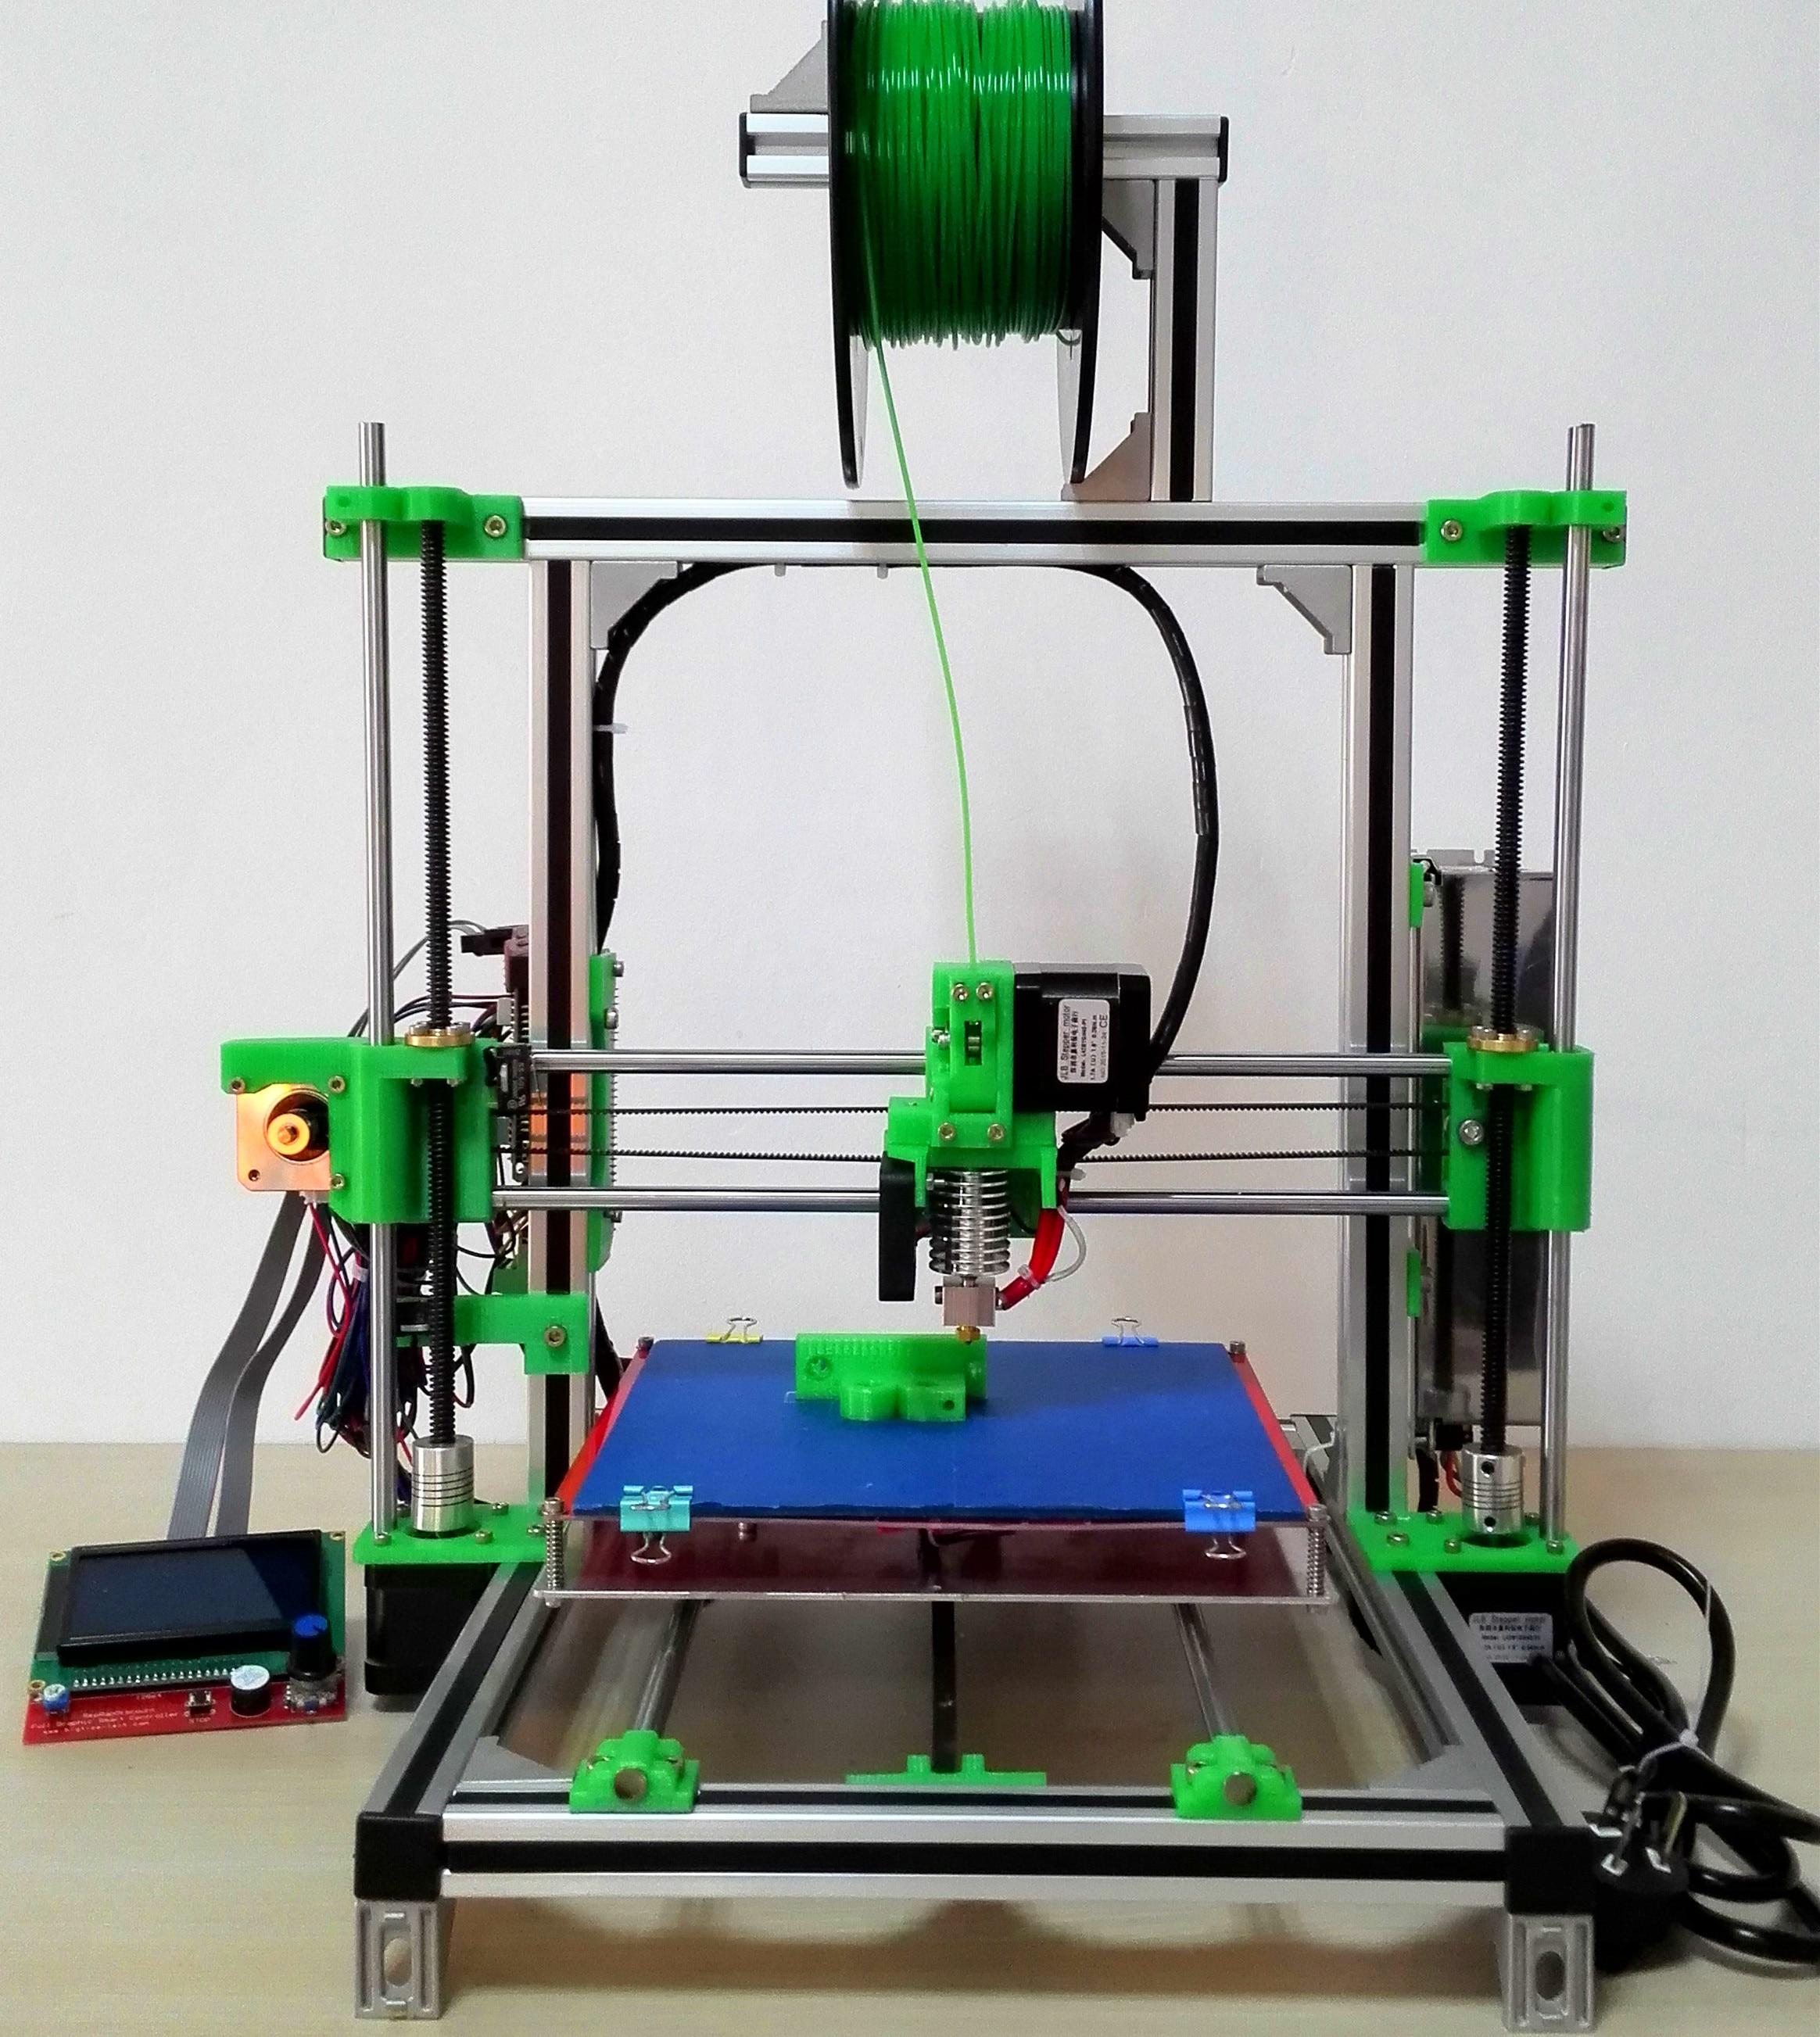 3d printer kit household high accuracy prusa i3 aluminum profile diy kit 3d printer